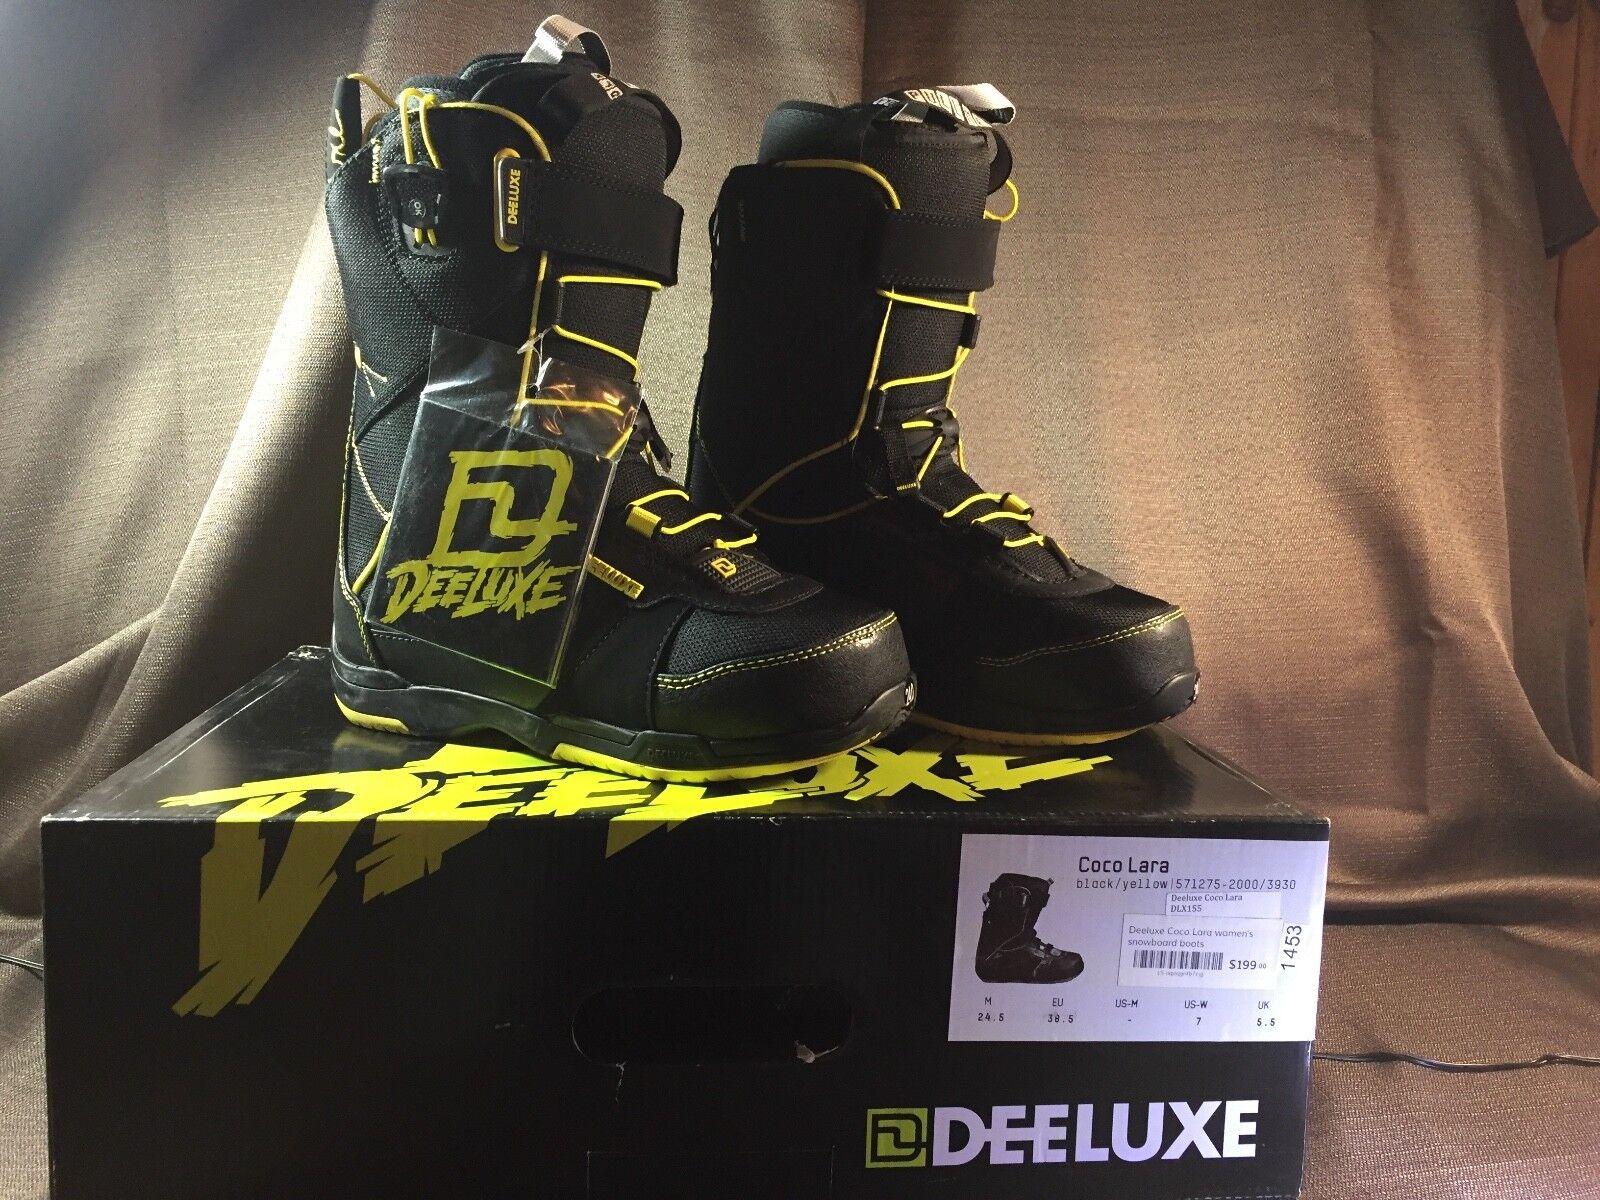 Deeluxe Women's Coco Lara snowboard boots Size 7 New in box